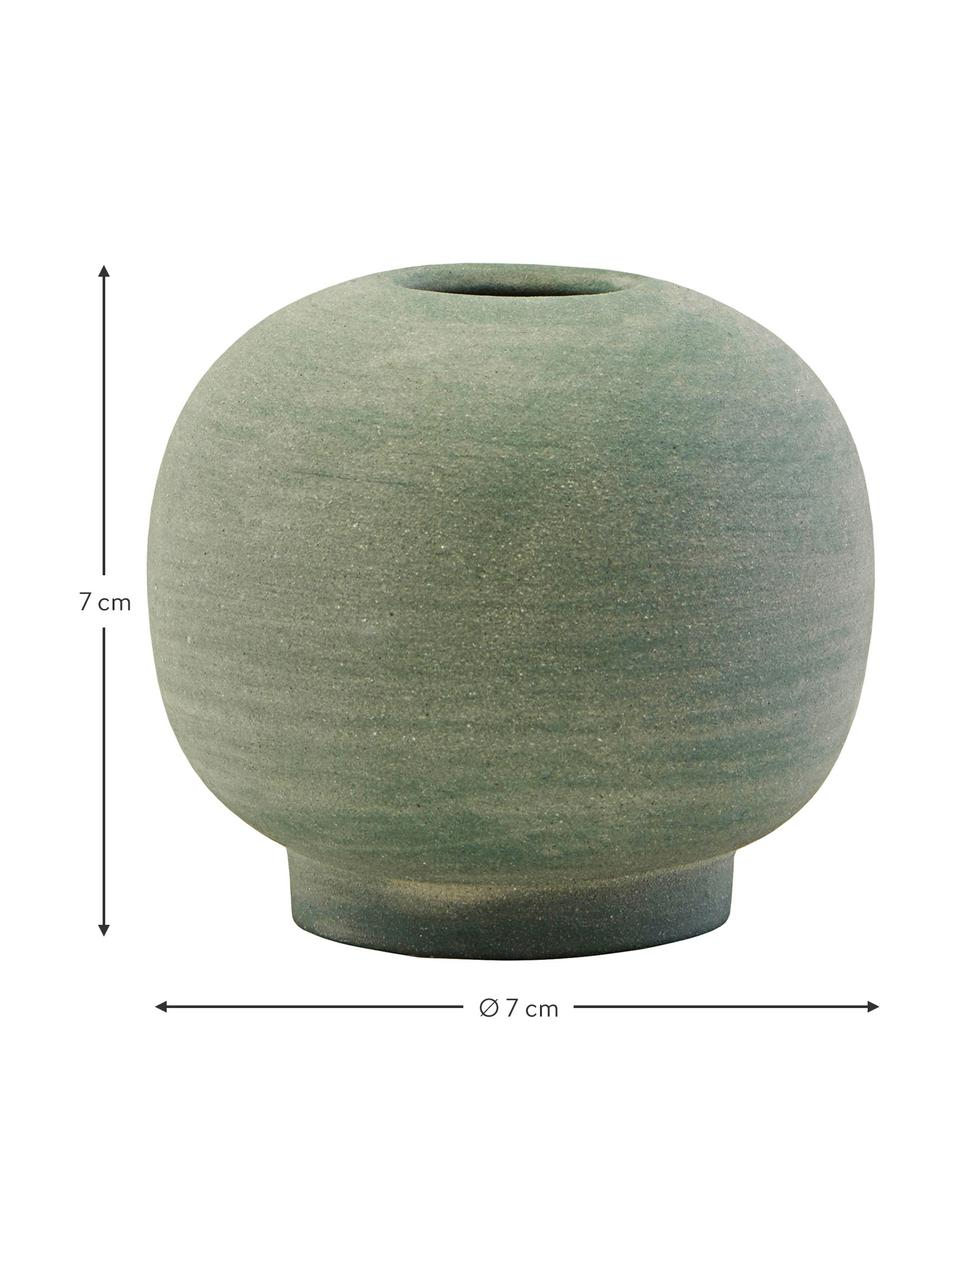 Vaso decorativo in gres fatto a mano Bobbles, Gres, Verde, Ø 7 x Alt. 7 cm